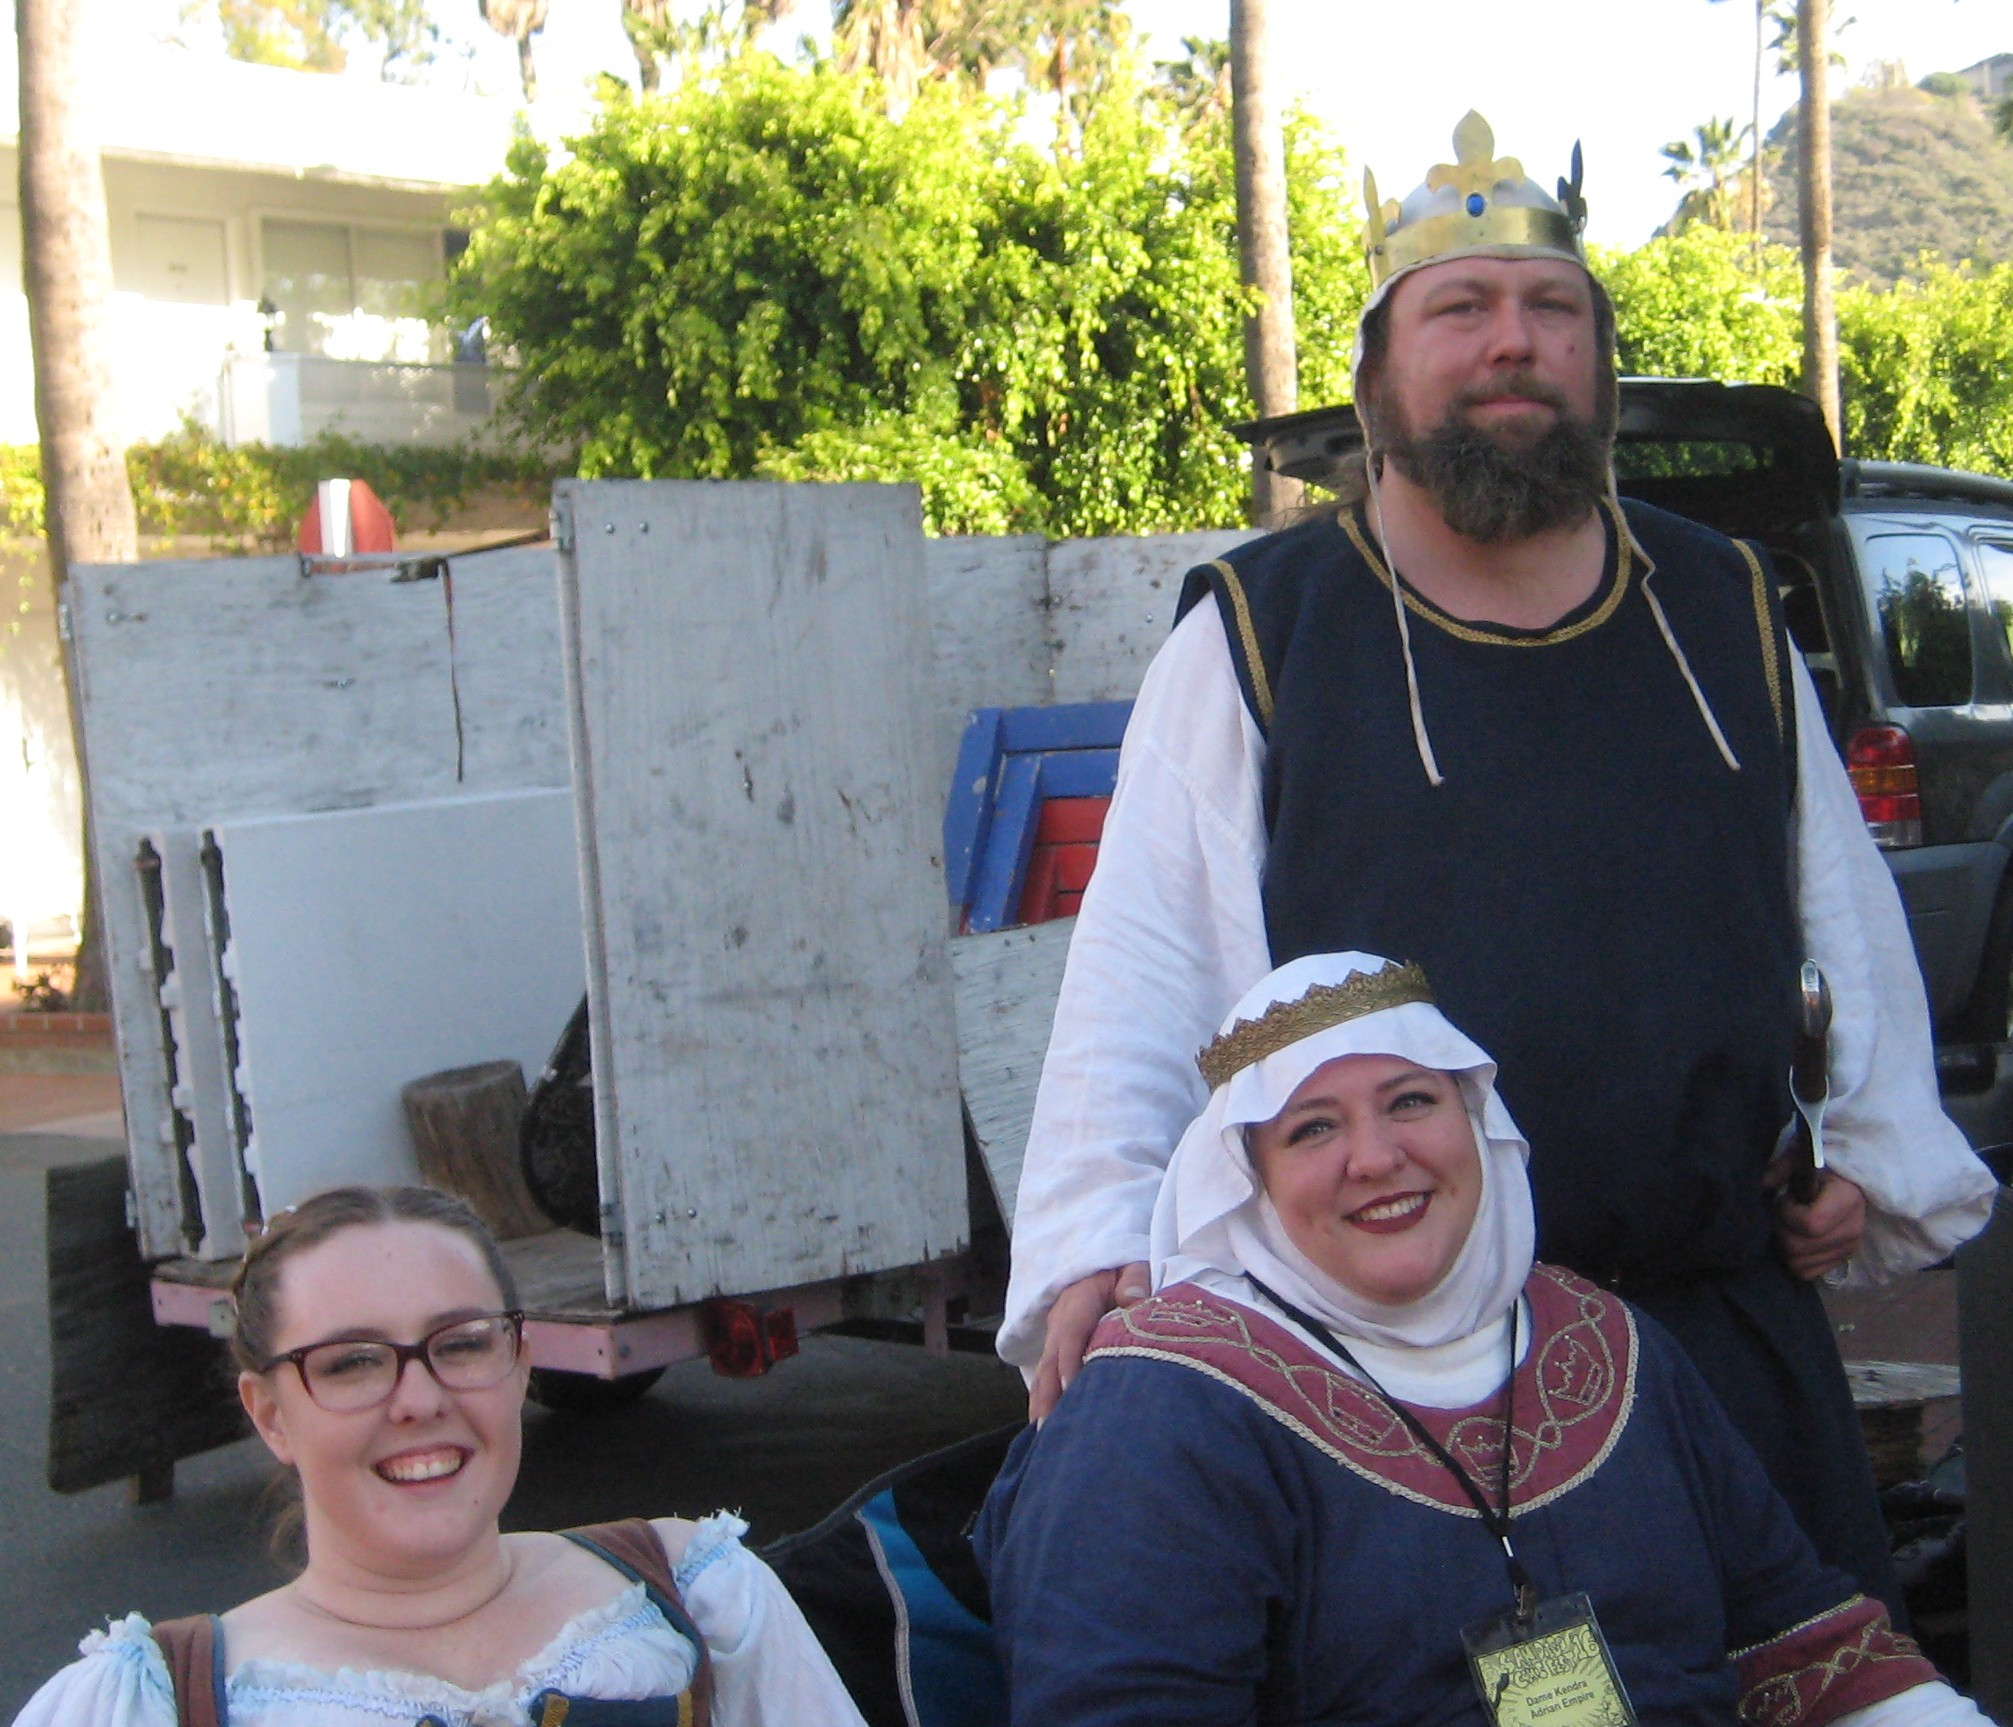 cosplayers of Kingdom of Terre Neuve